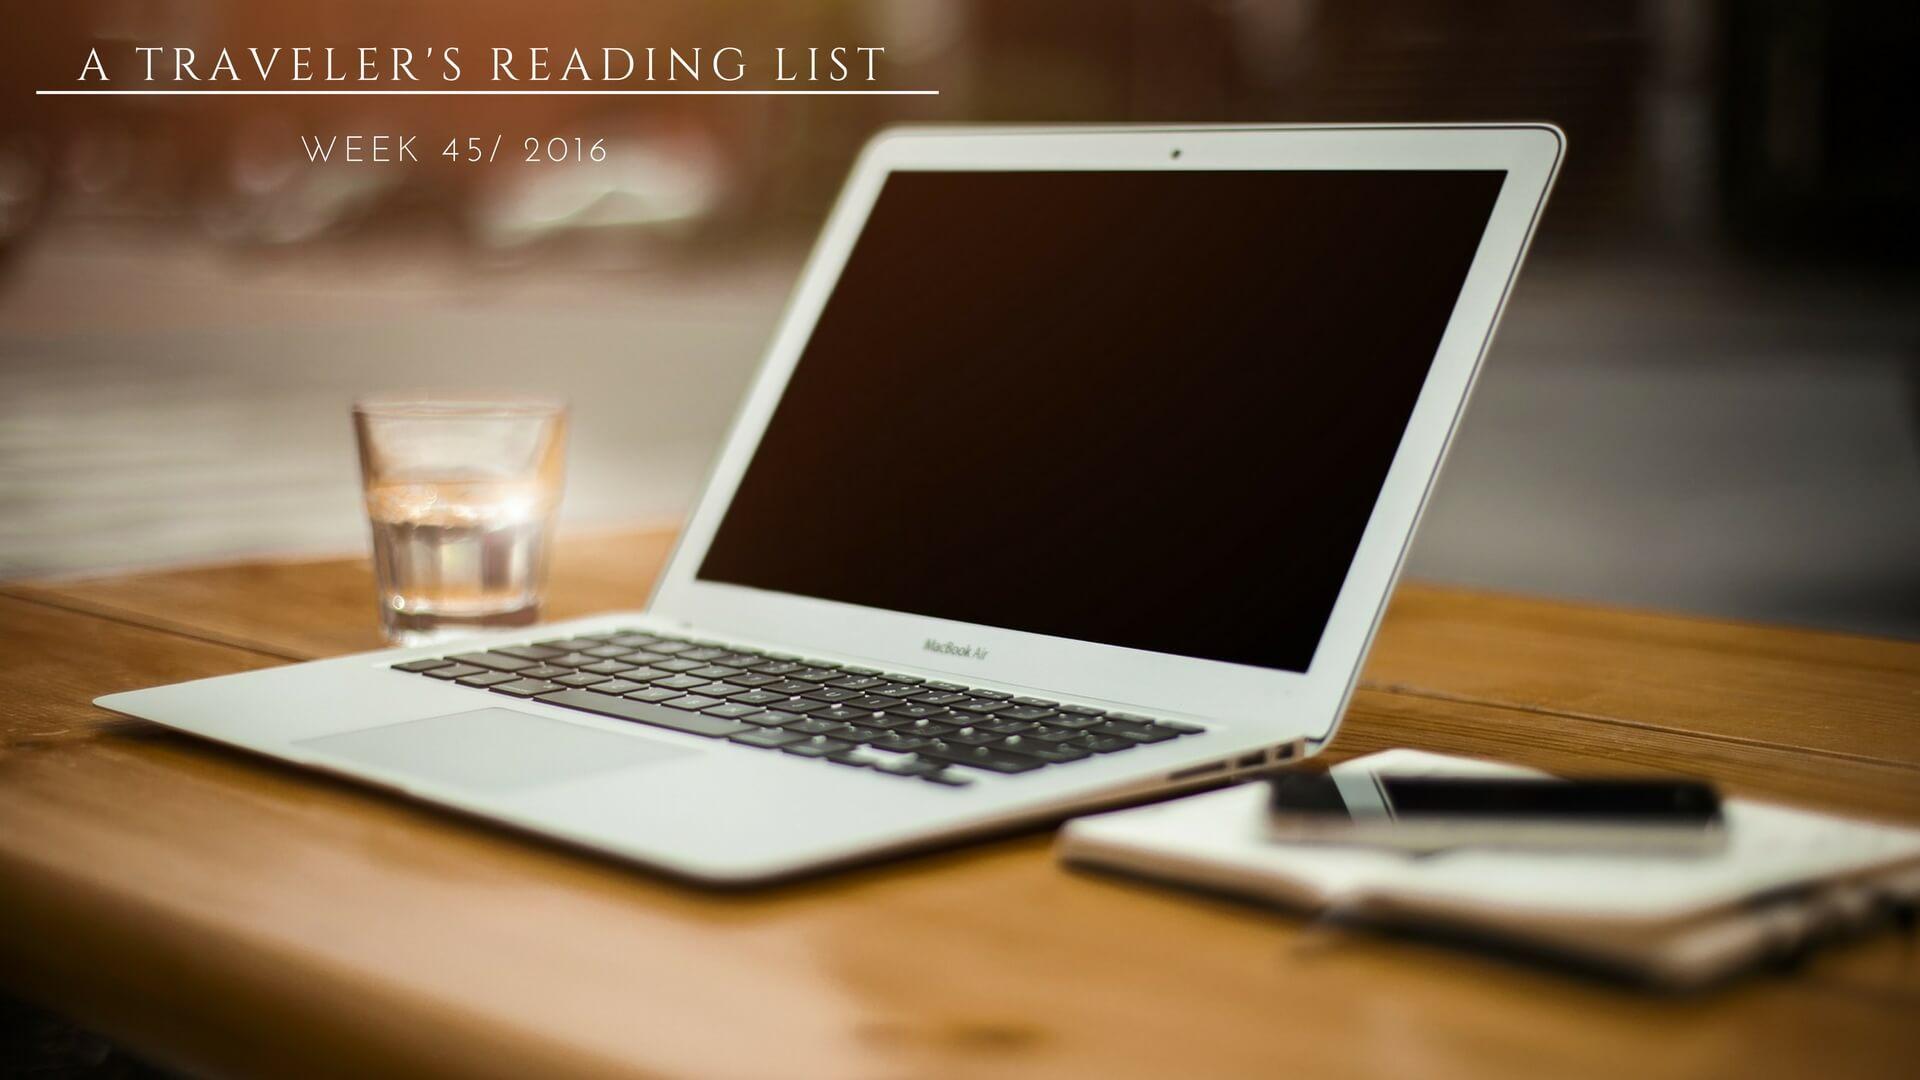 A Traveler's Reading List 45/2016